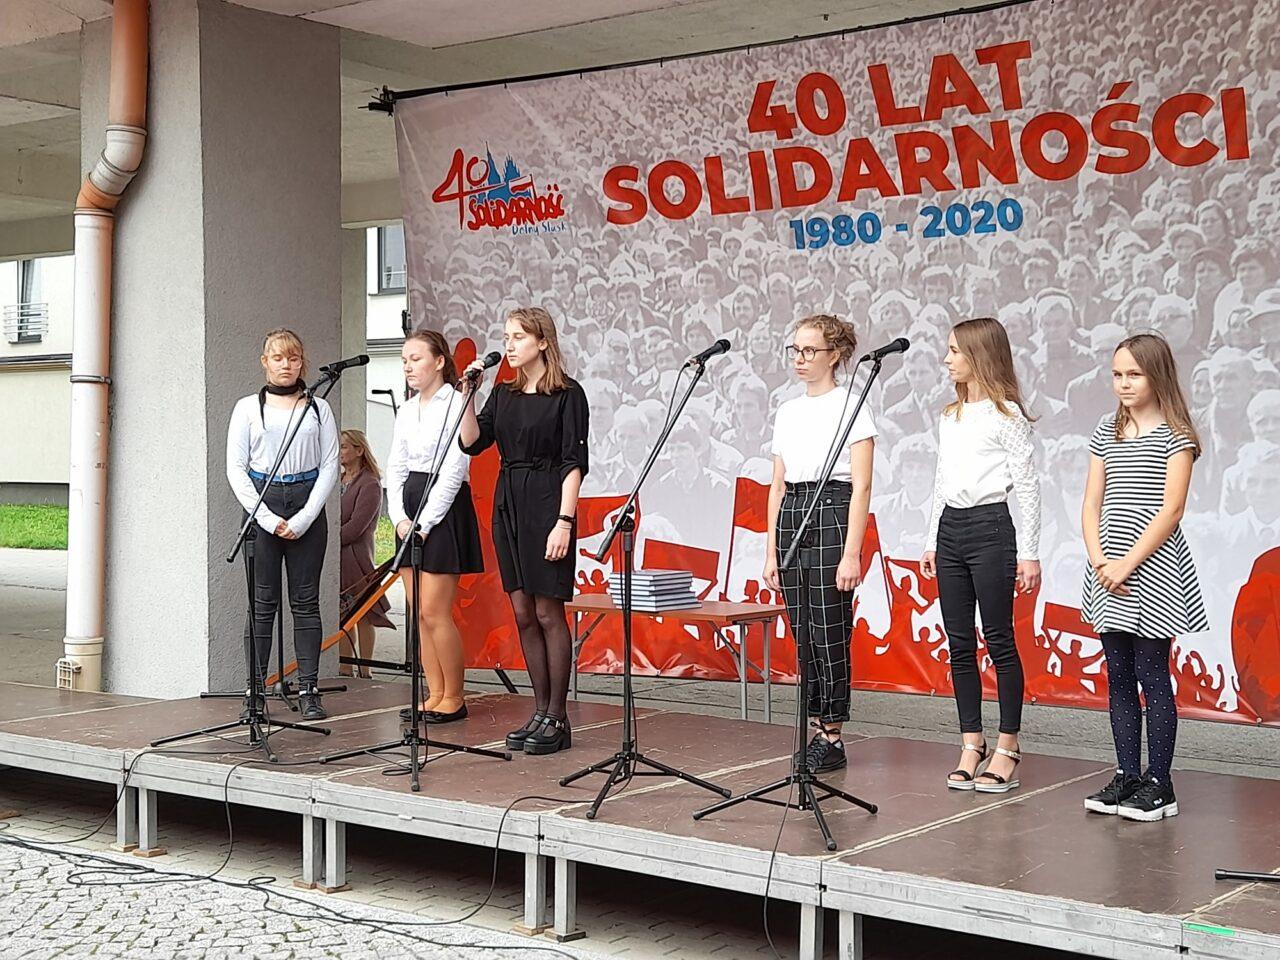 40 lecie powstania Solidarności